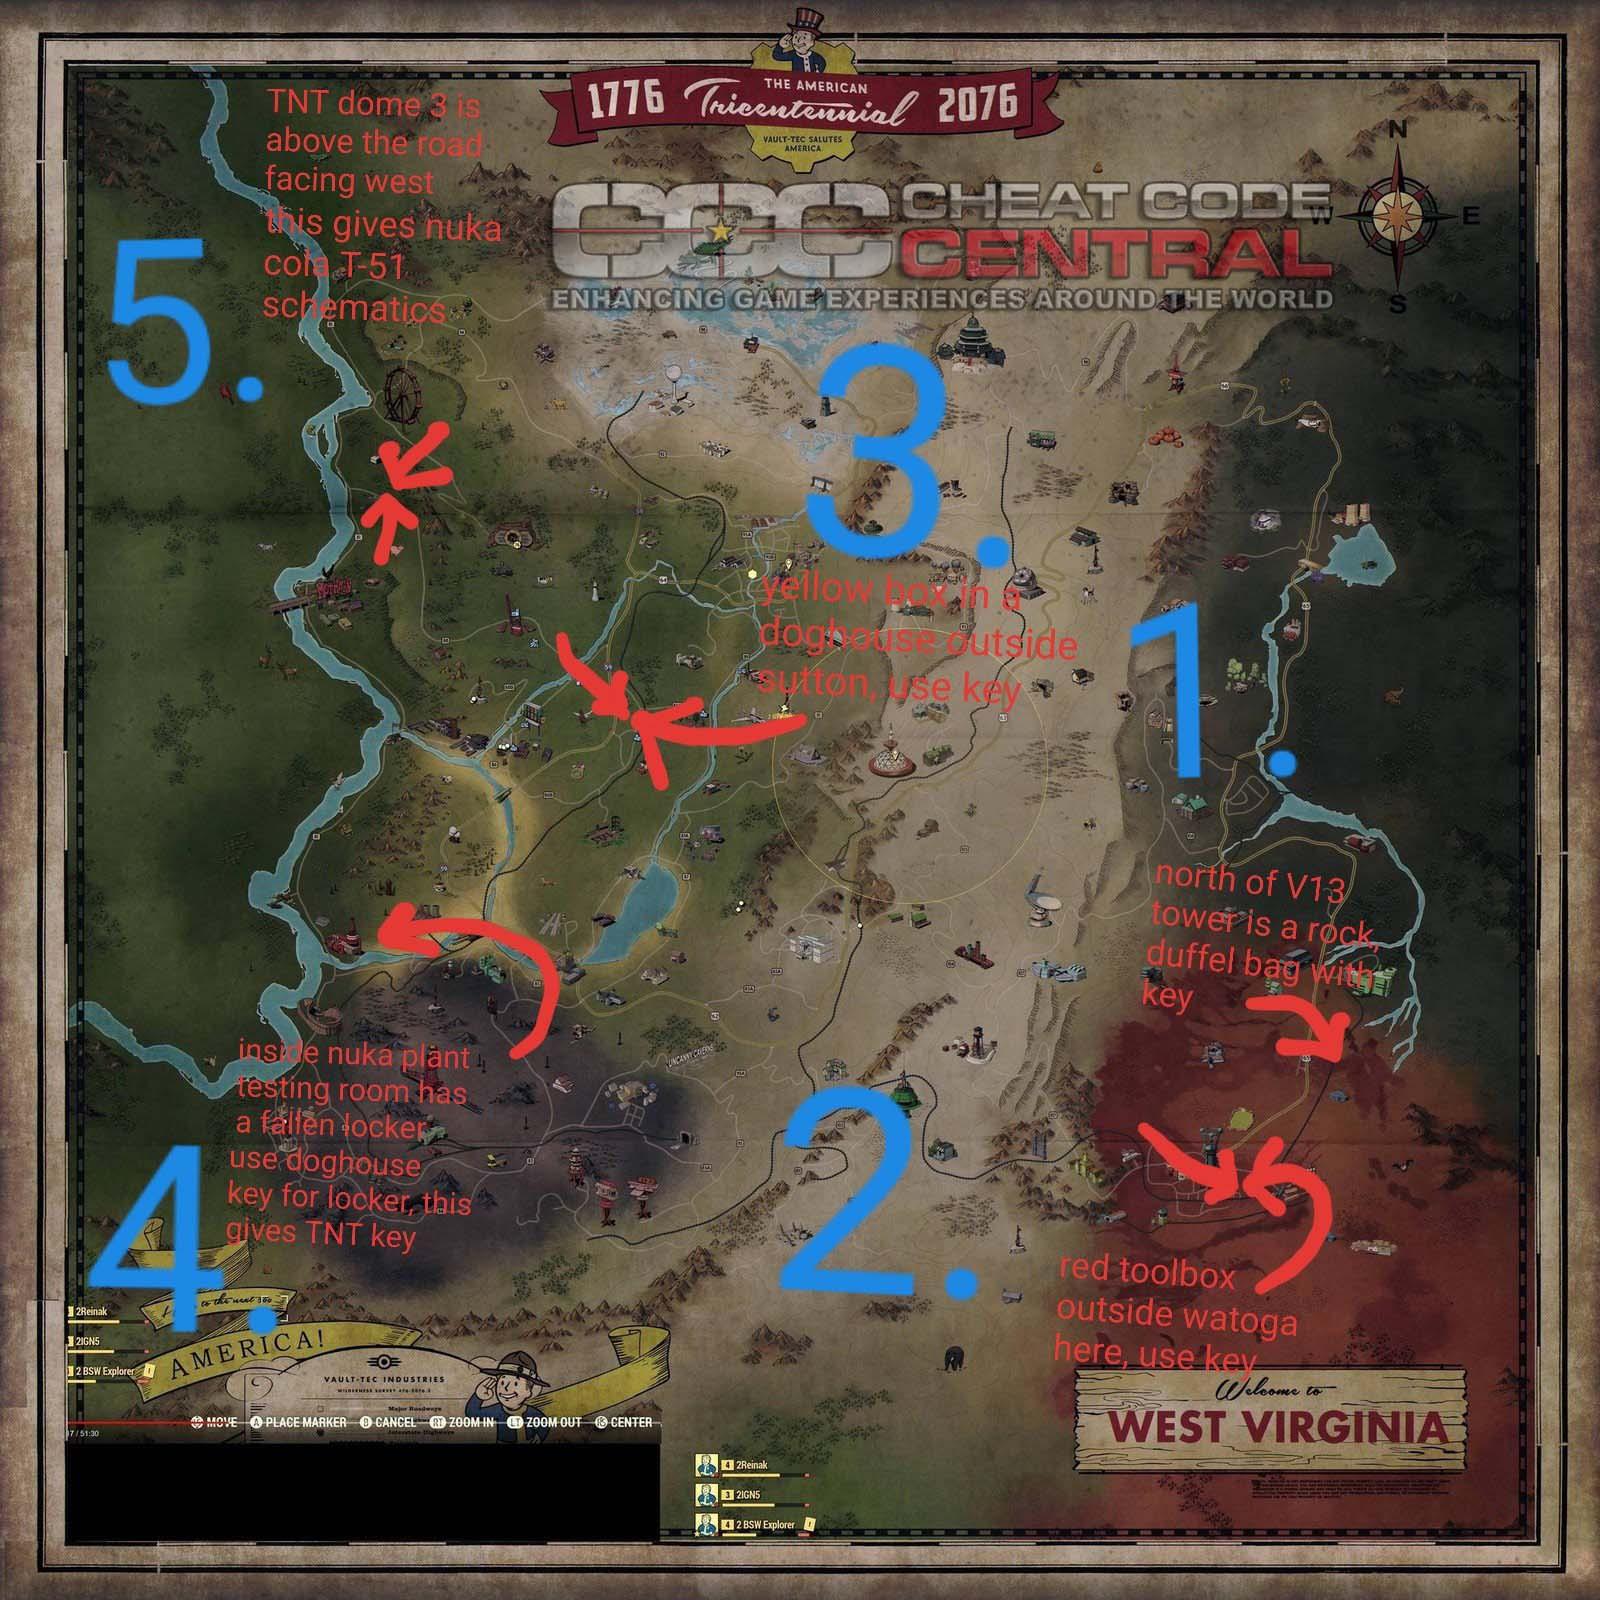 Fallout 76 Cheats Codes Cheat Codes Walkthrough Guide FAQ Unlockables For Xbox One